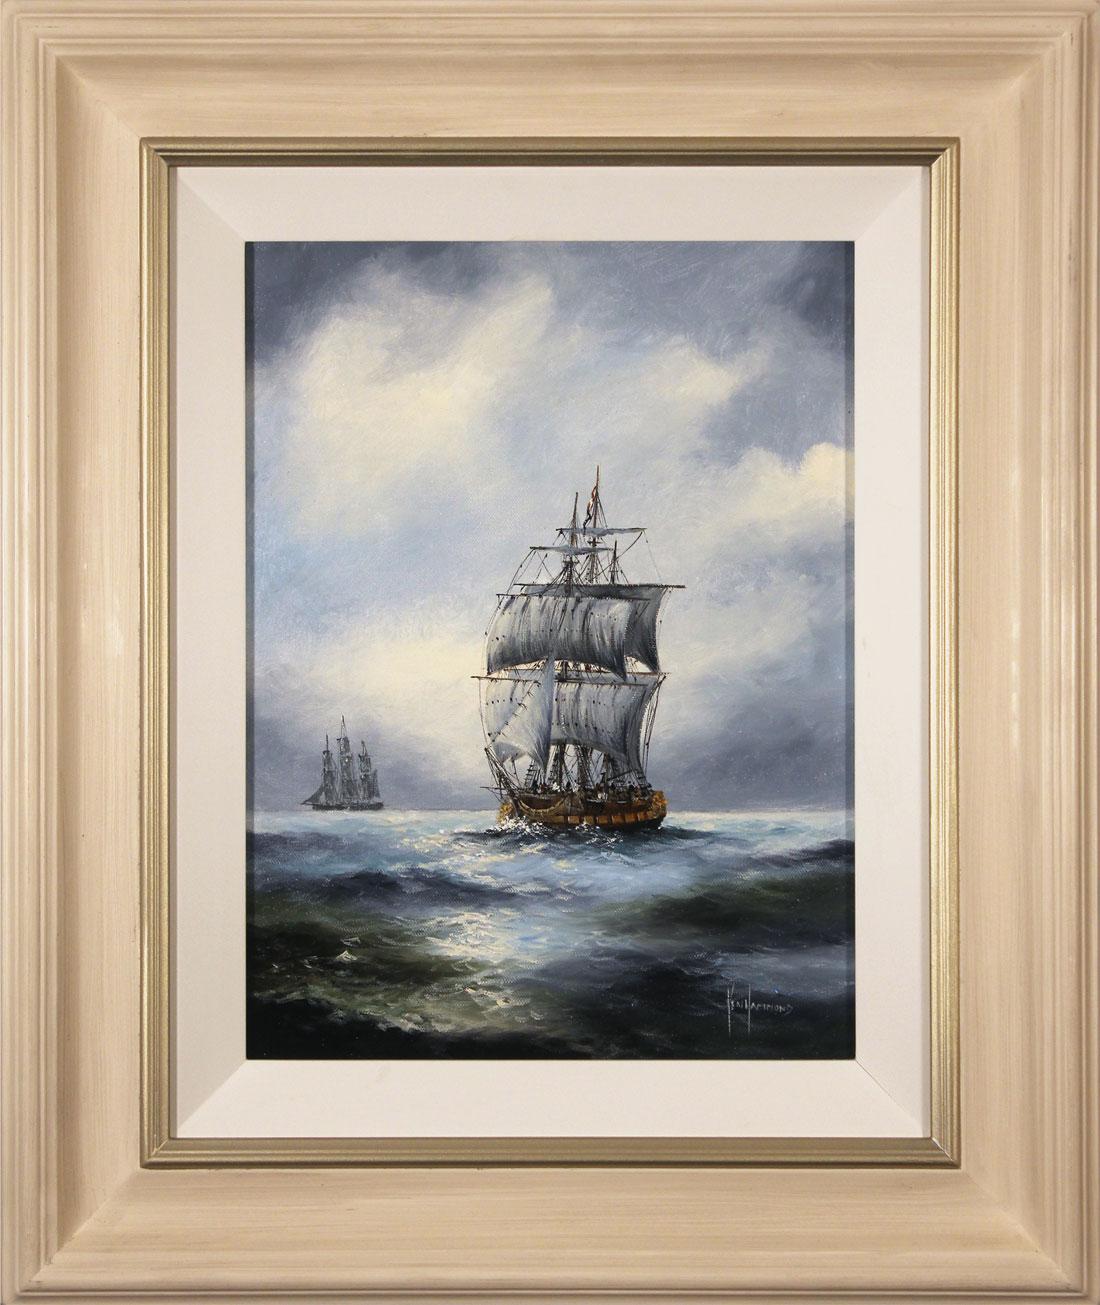 Ken Hammond, Original oil painting on canvas, High Seas, click to enlarge